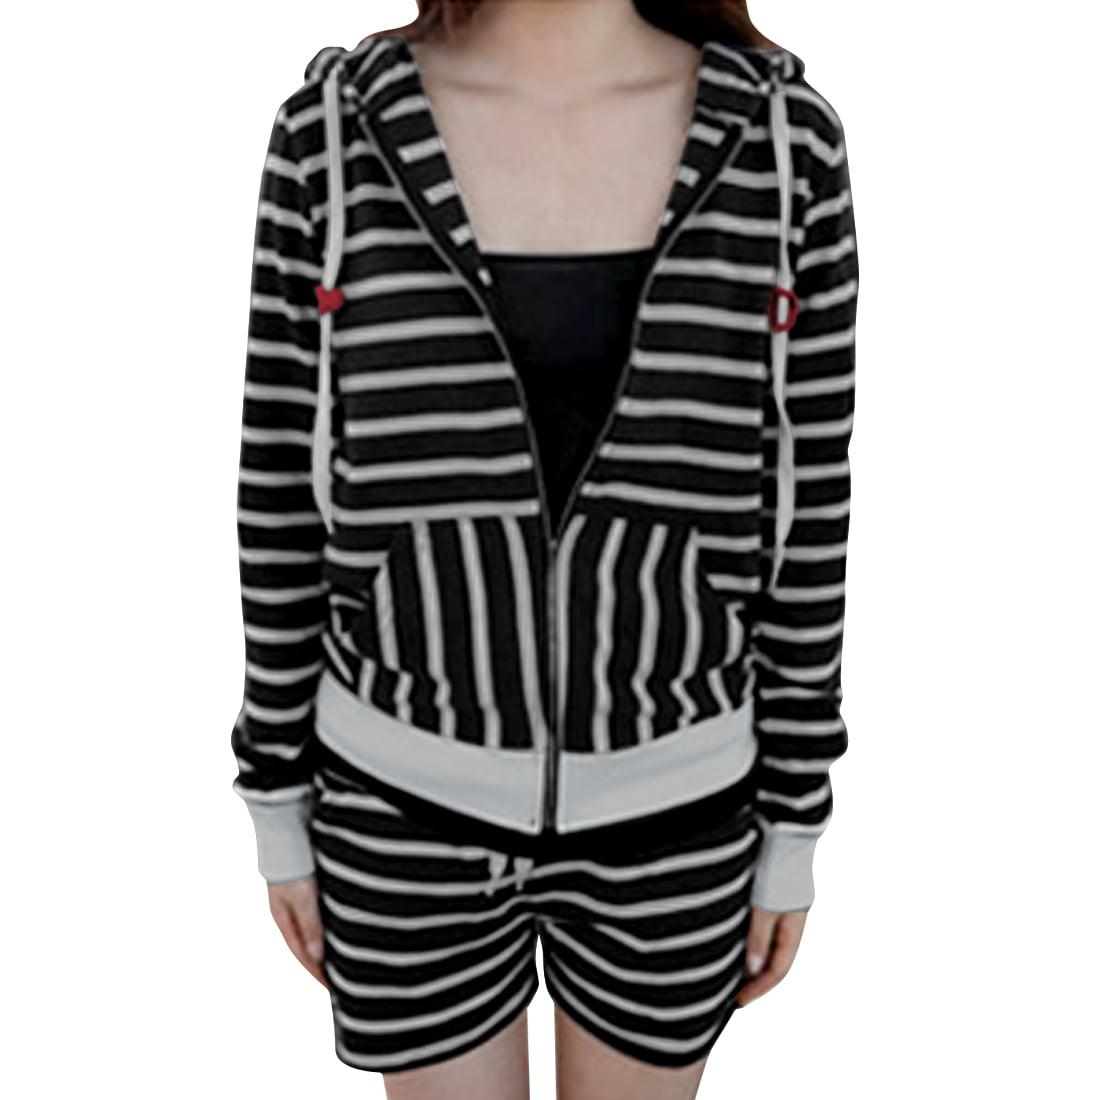 Women Hoodie Zipper Closure & Drawstring Waist Black Gray Shorts XS